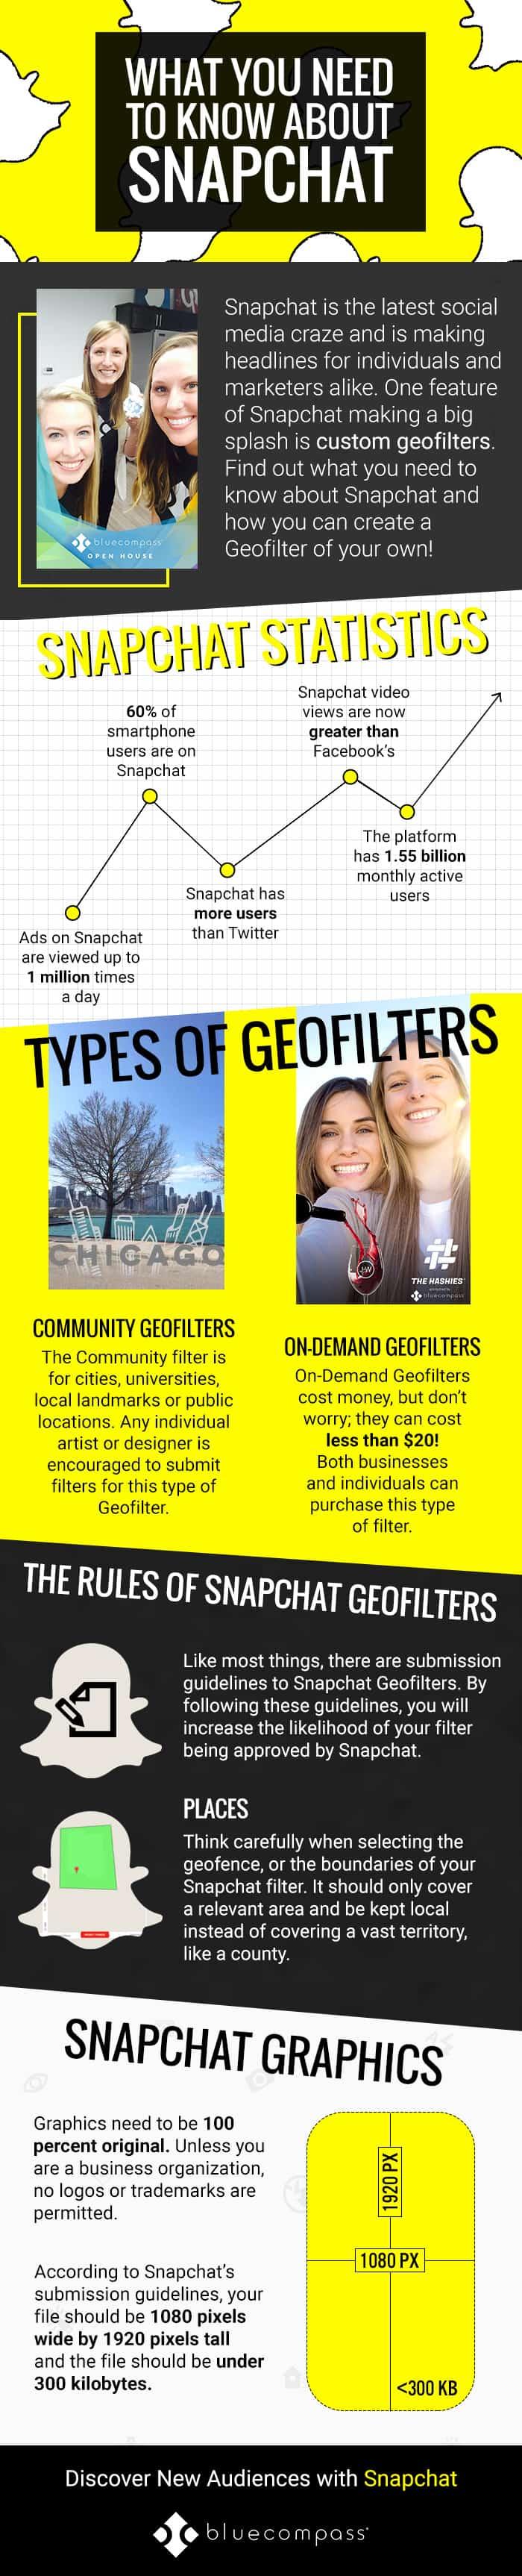 Create Custom Snapchat Geofilter